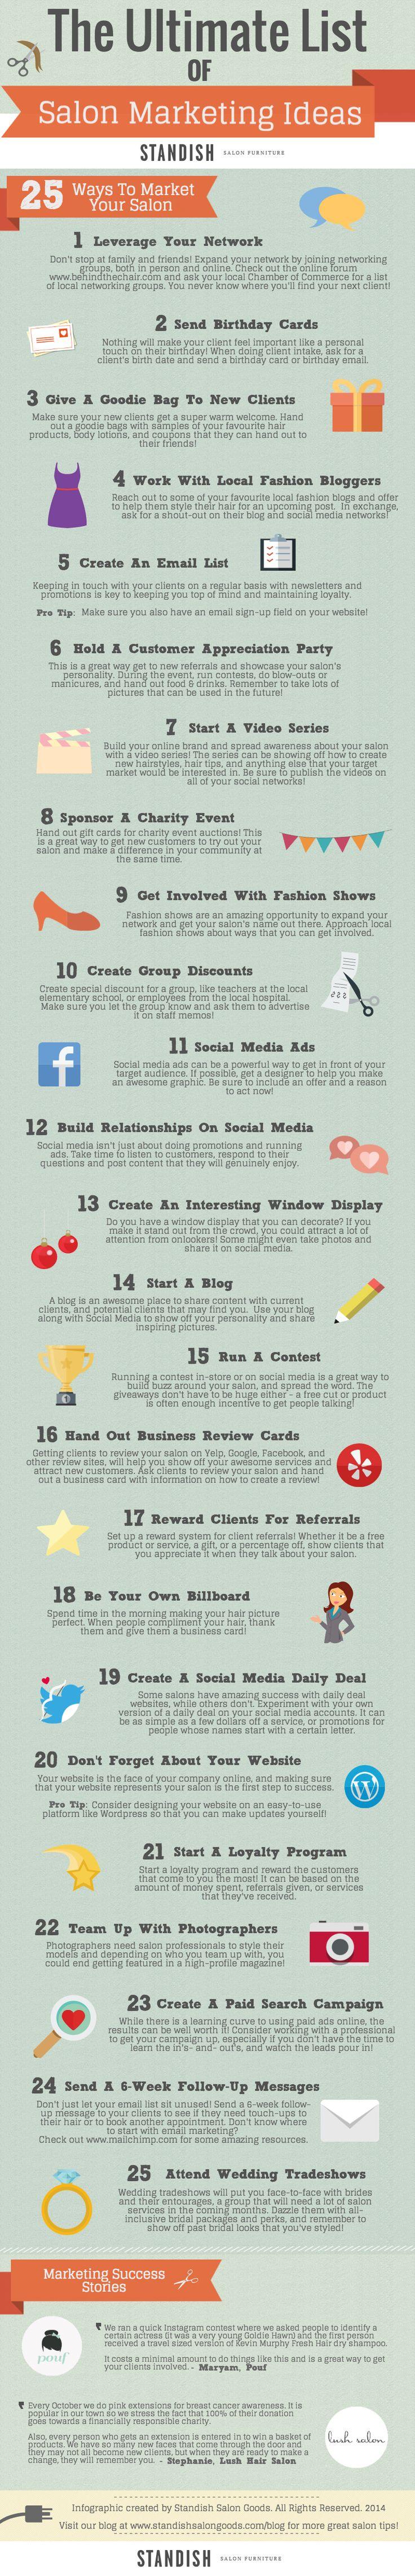 25 salon marketing ideas infographic.jpg